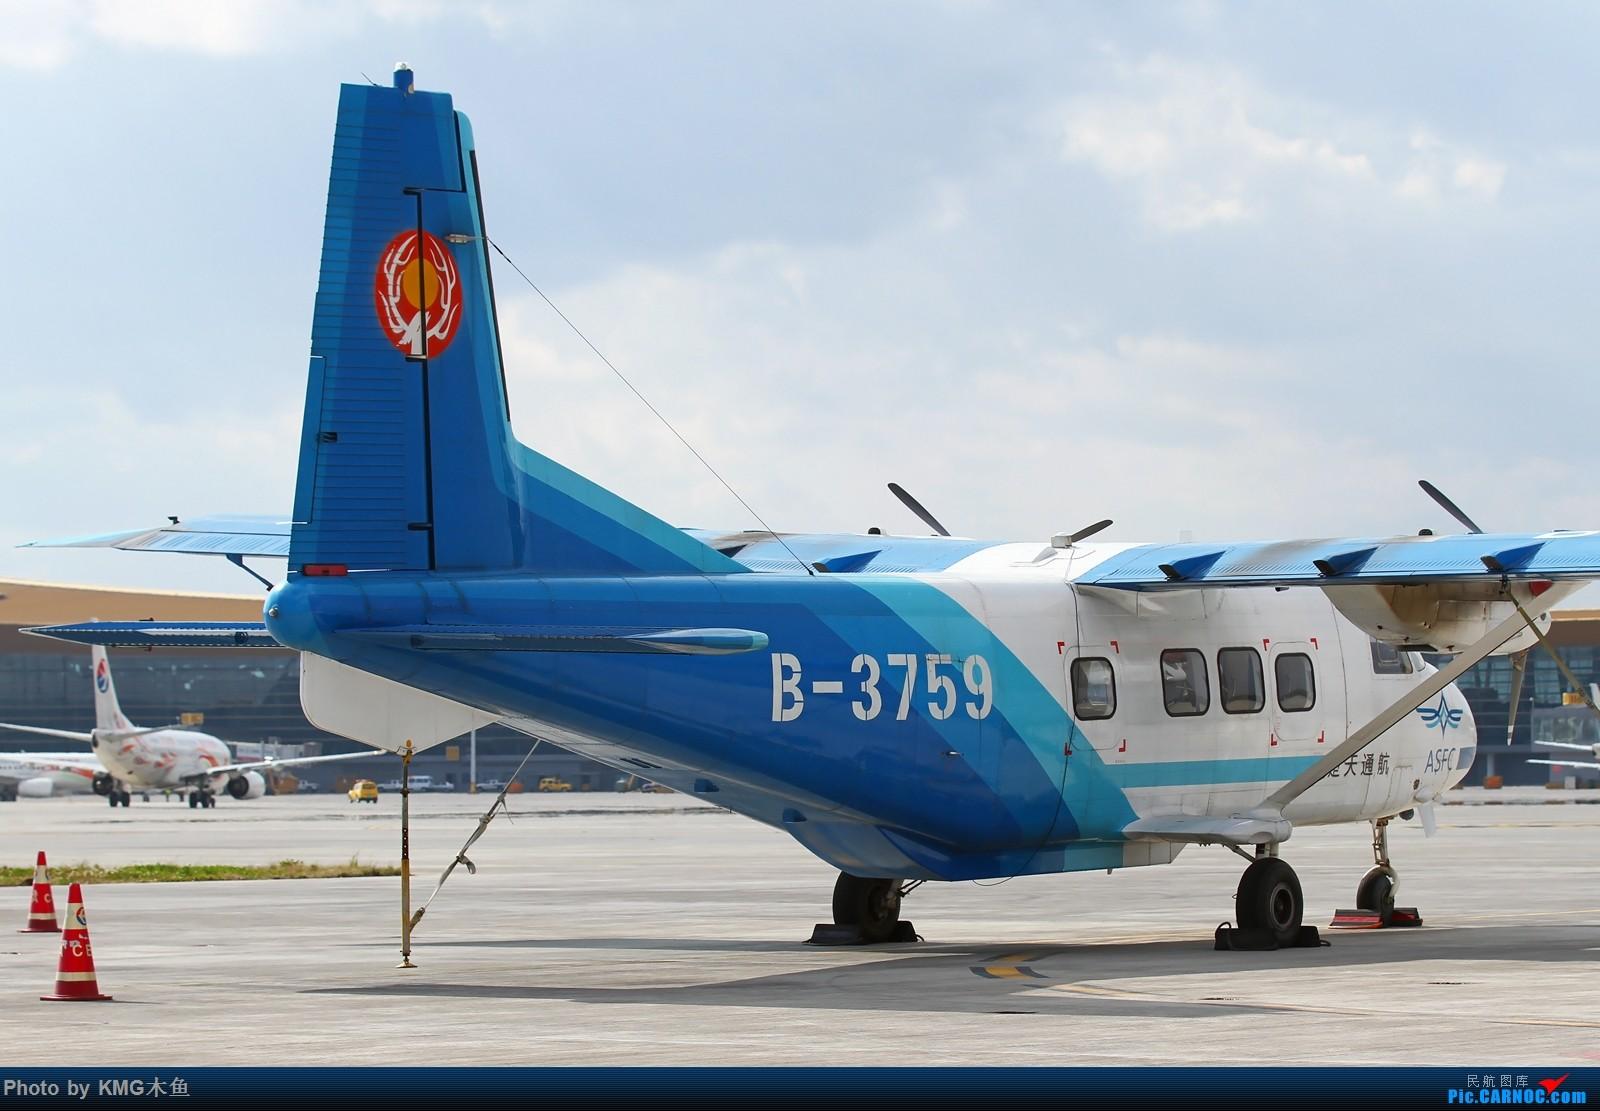 Re:[原创]【KMG昆明长水国际机场】昆明机场地面的精灵们 HAFEI Y12IV B-3759 中国昆明长水国际机场机场